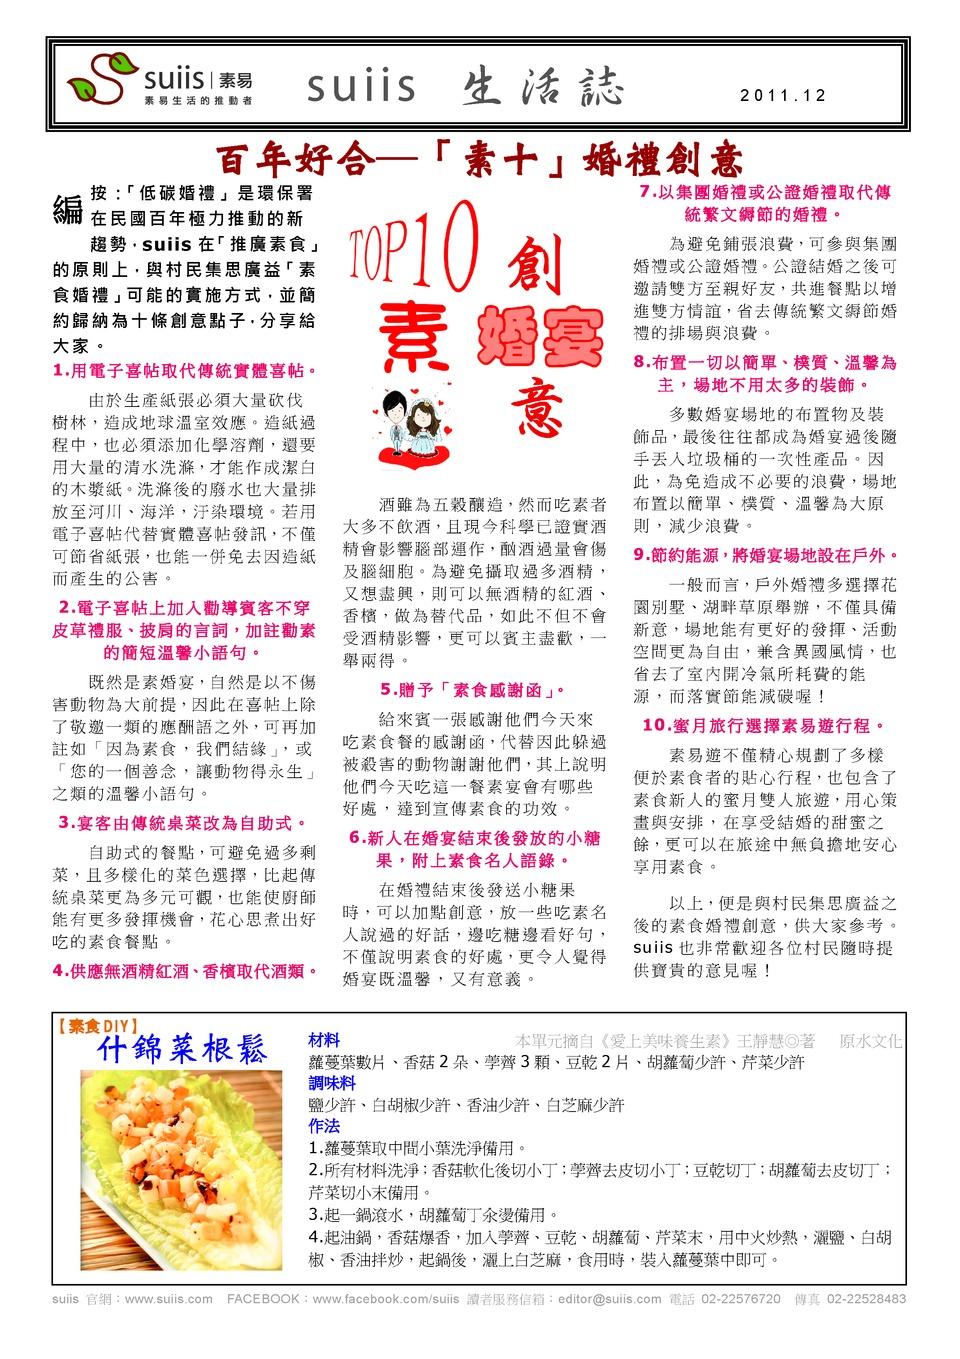 suiis 生活誌-2011-12_Page_1